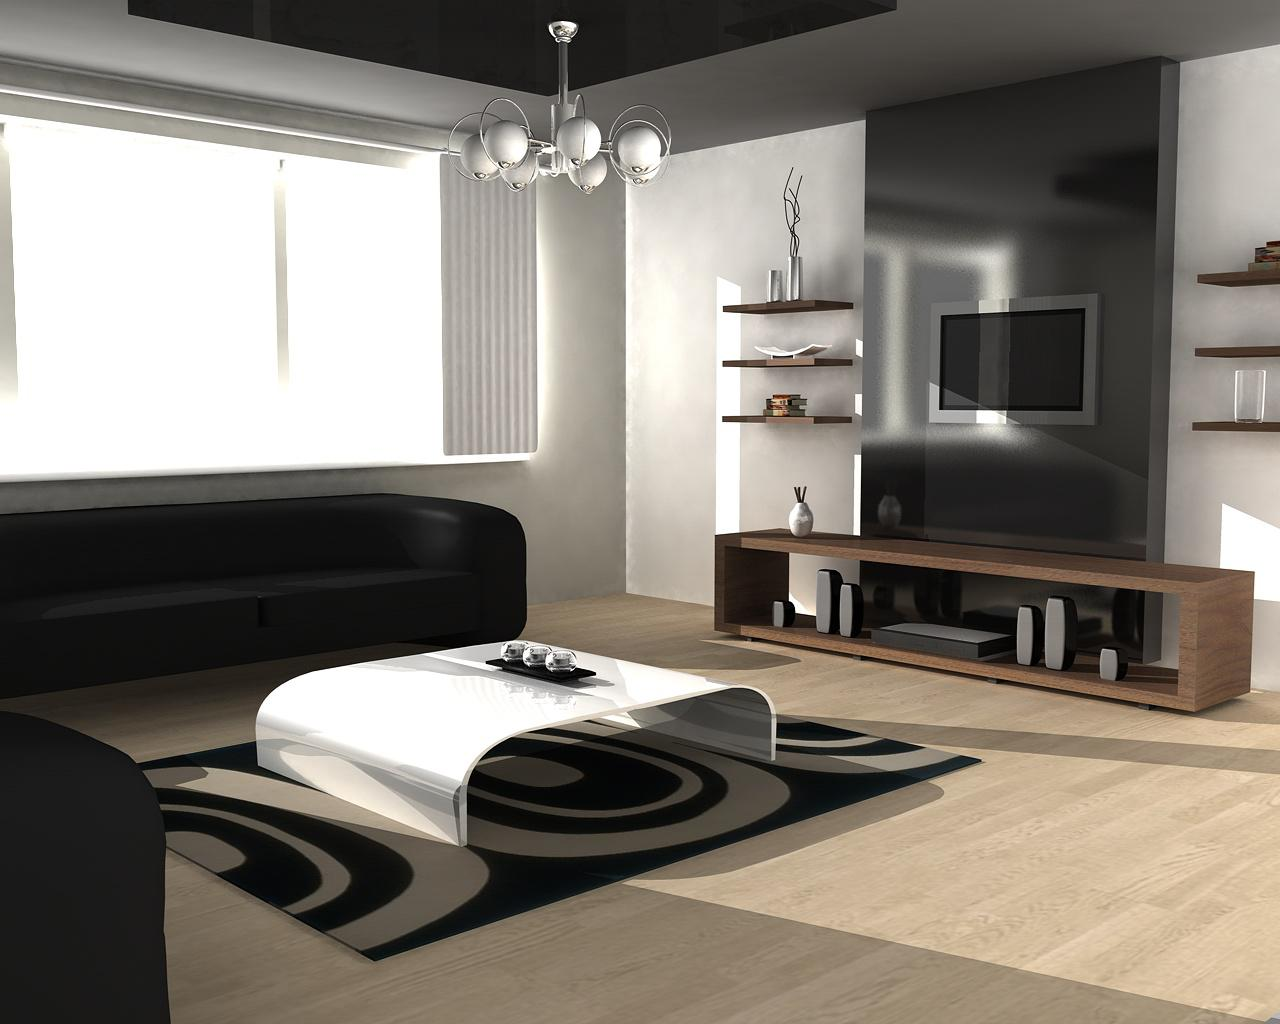 living_room_nice_design-1580345